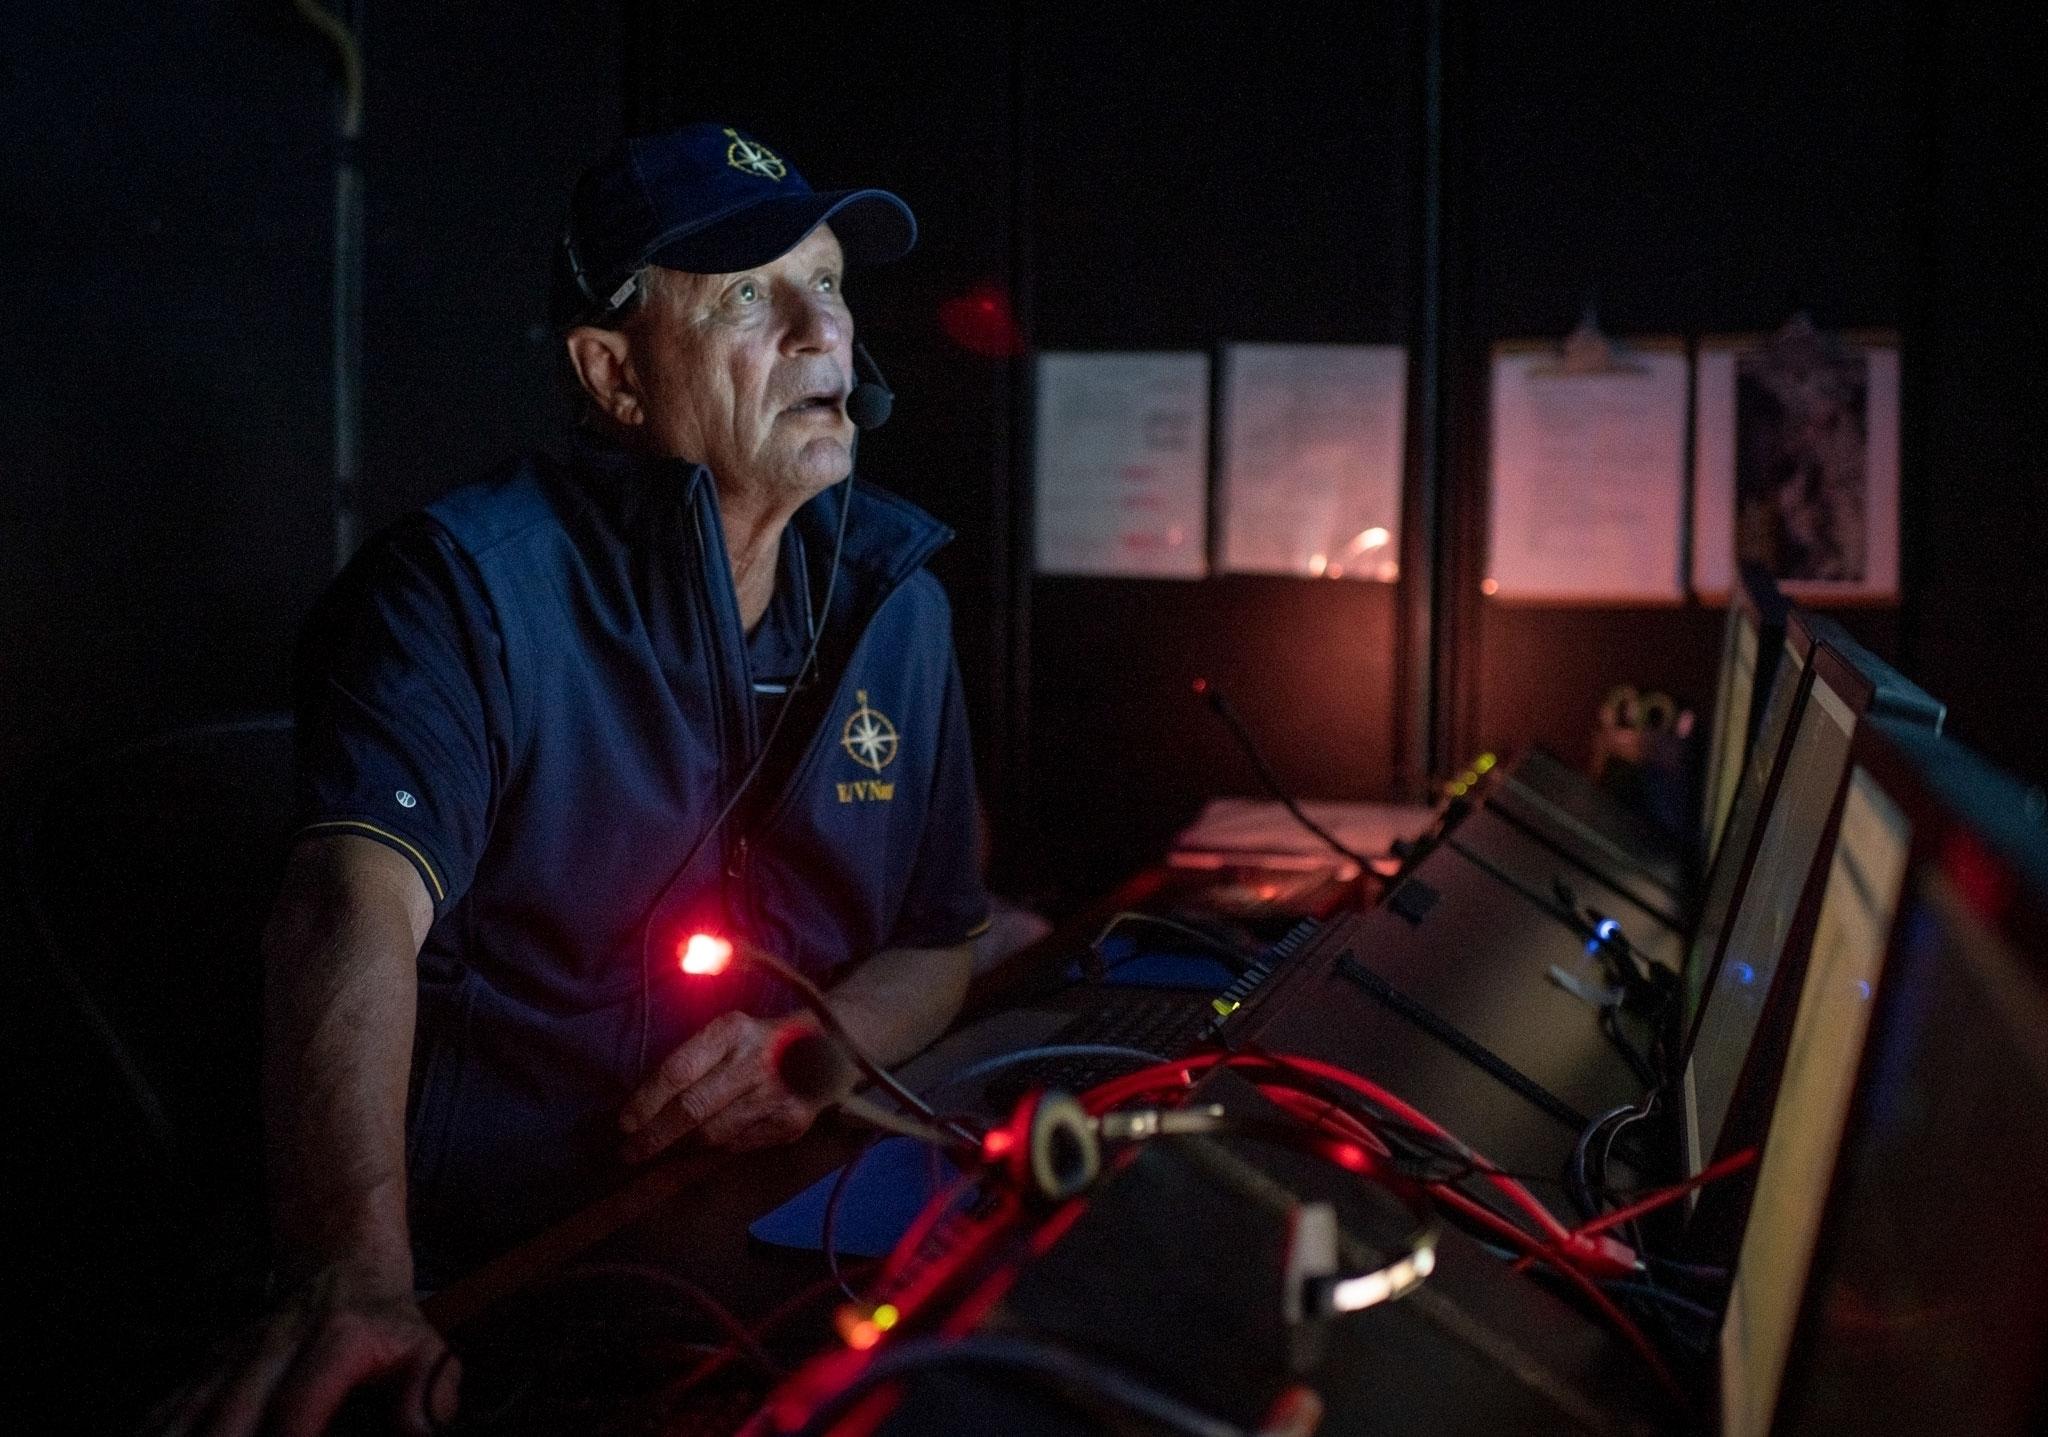 Explorer Bob Ballard — the Man Who Found Titanic — Talks Shipwrecks, Sea Creatures, STEM